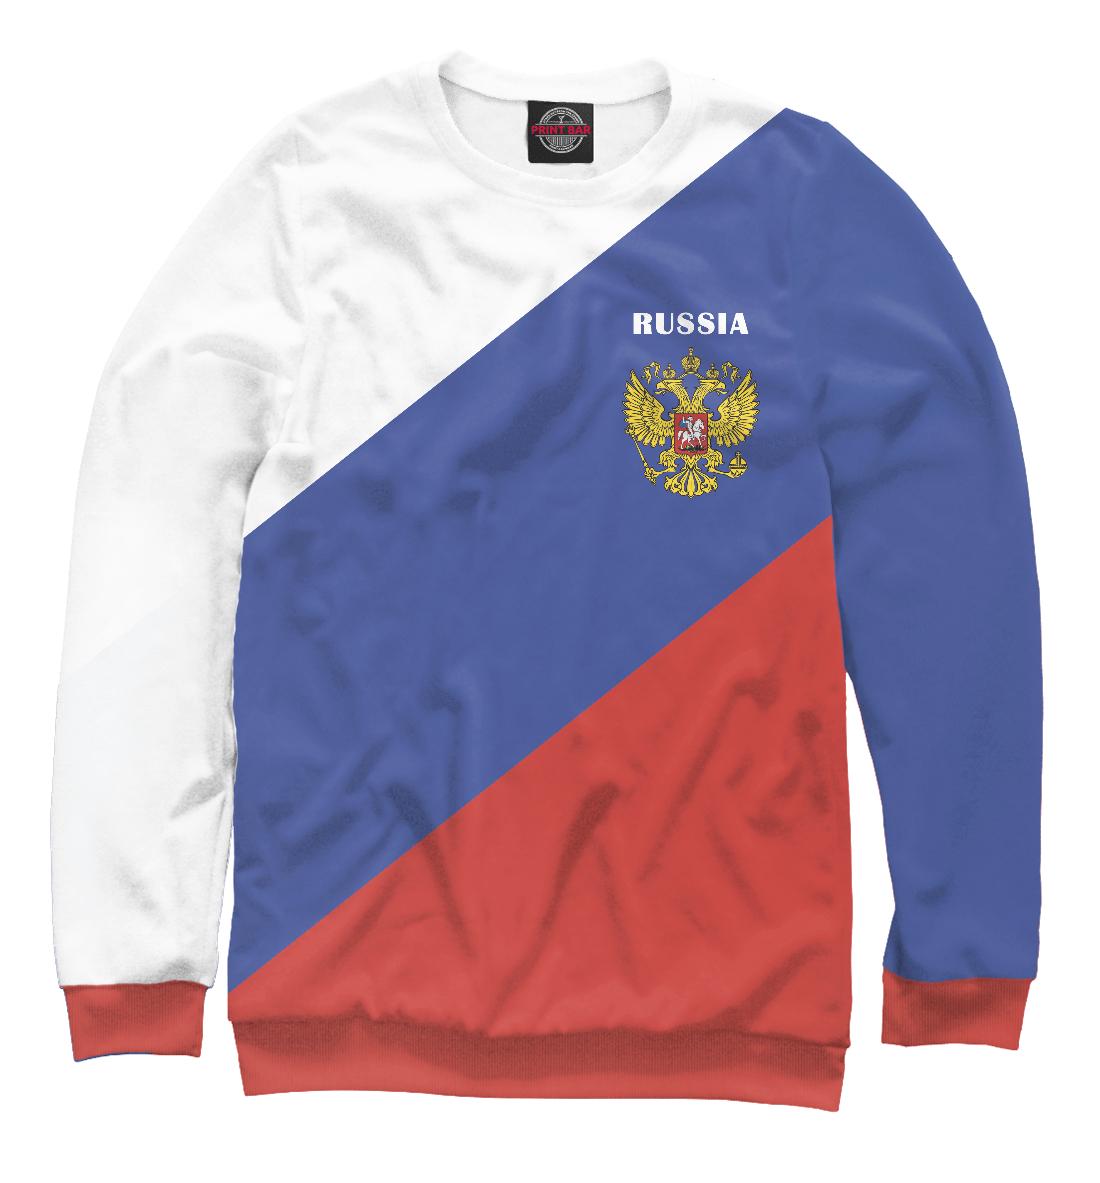 Купить Триколор России, Printbar, Свитшоты, SRF-406765-swi-1